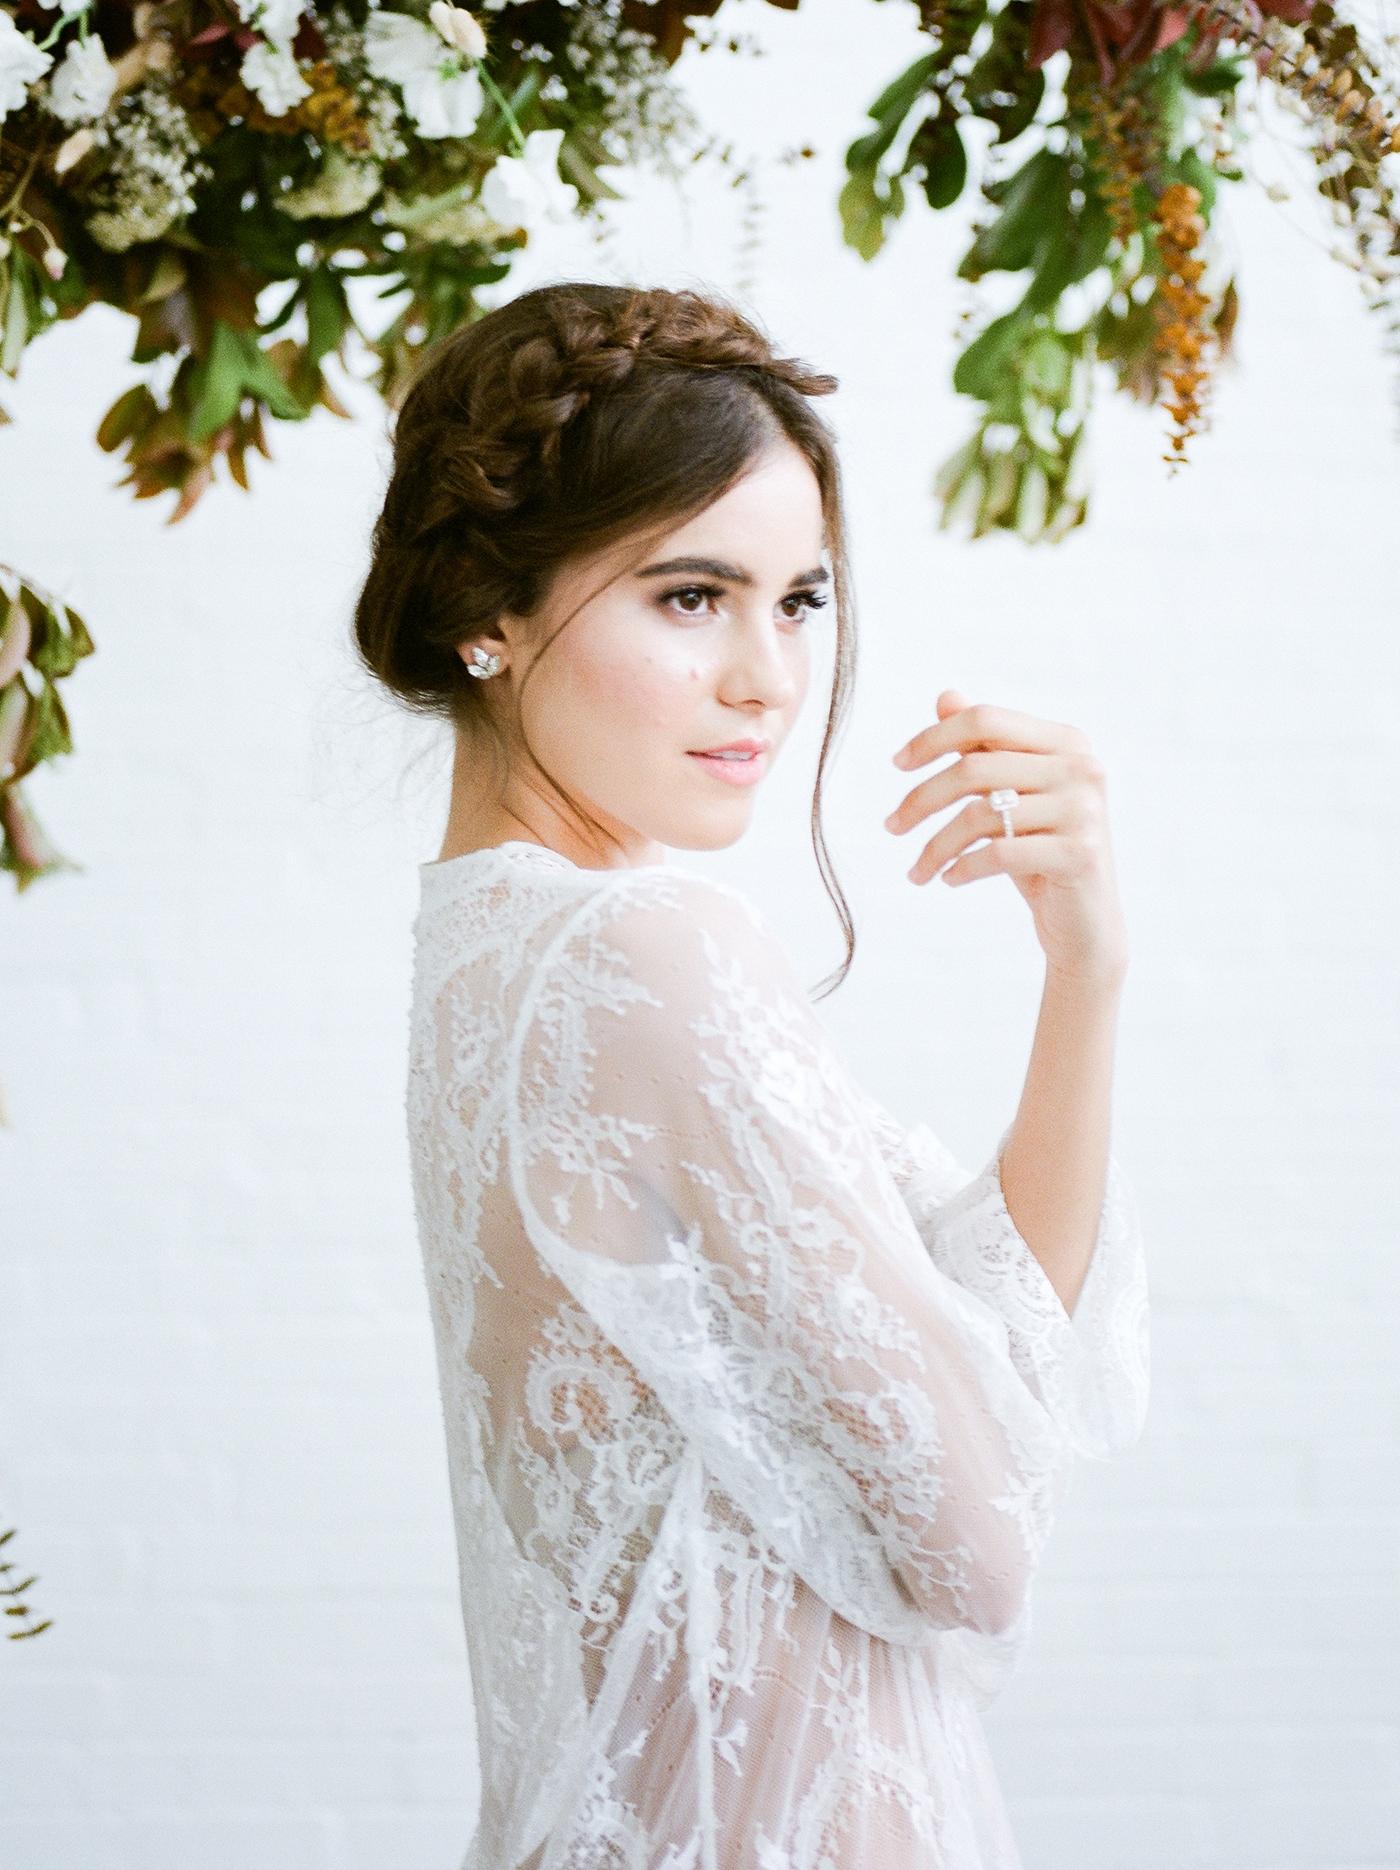 Wedding Floral Design Dallas - Olive Grove Design - Mimimalist Fall Wedding - 00105.jpg